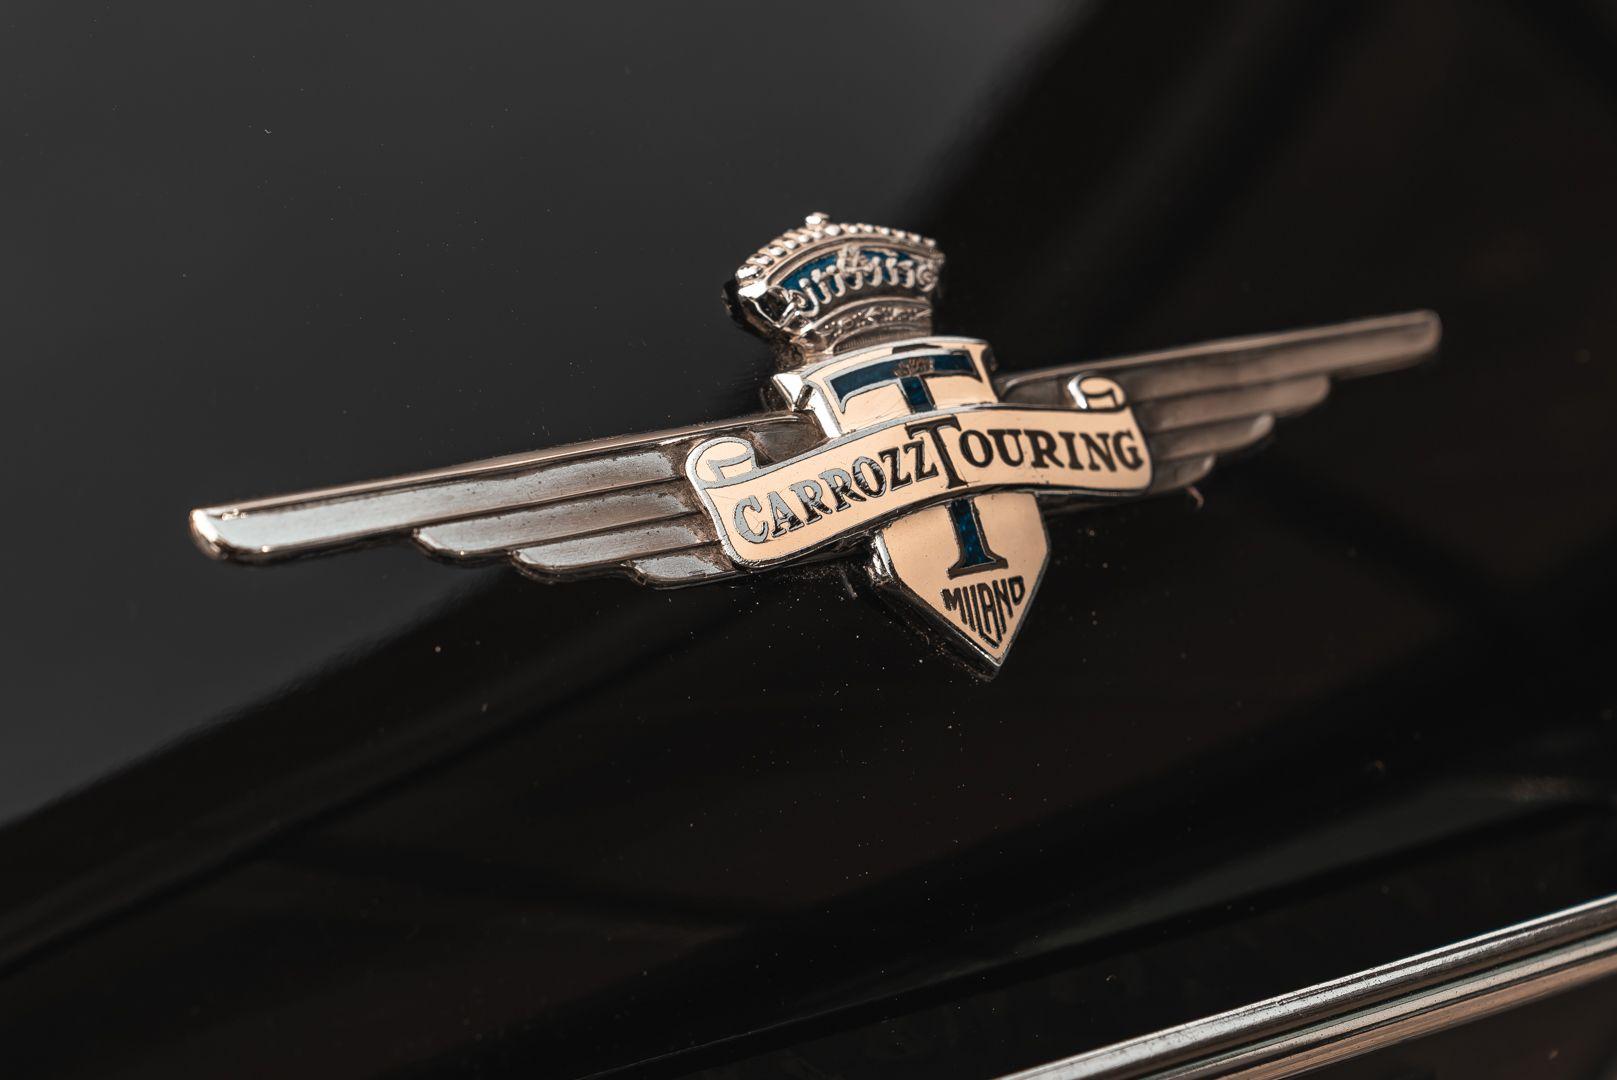 1968 Lancia Flaminia Touring Convertible 2800 3C 79154